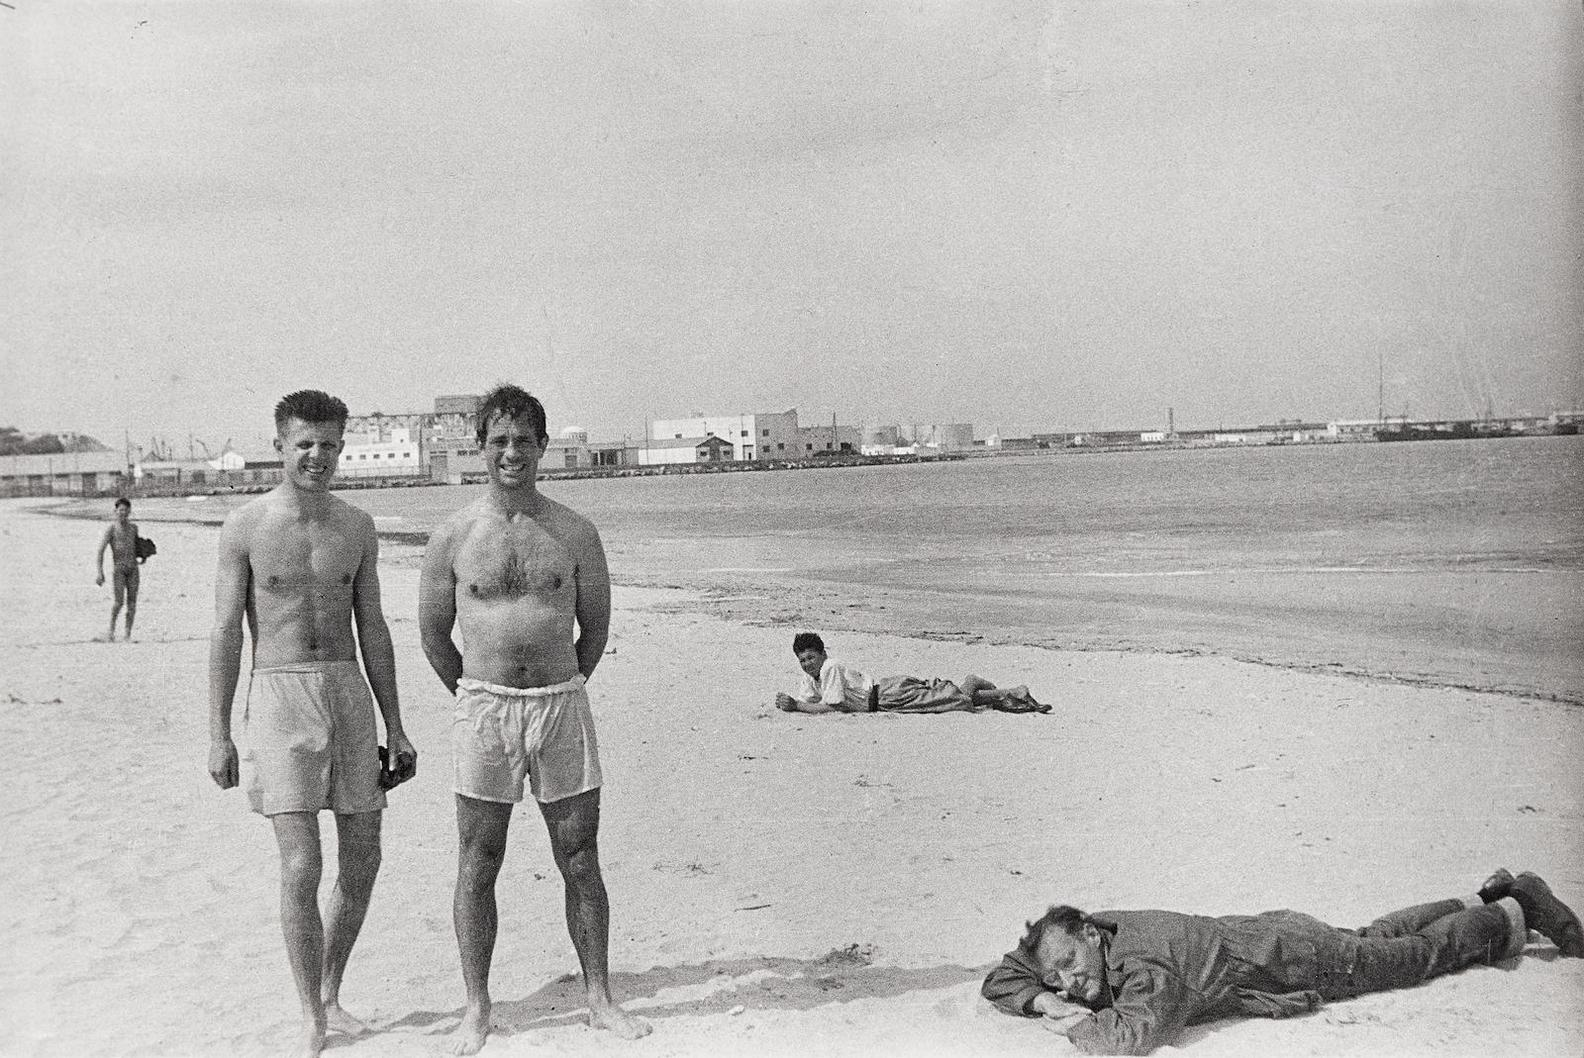 Allen Ginsberg - Jack Kerouac, Peter Orlovsky And William S. Burroughs, Tanger Beach, March-1957